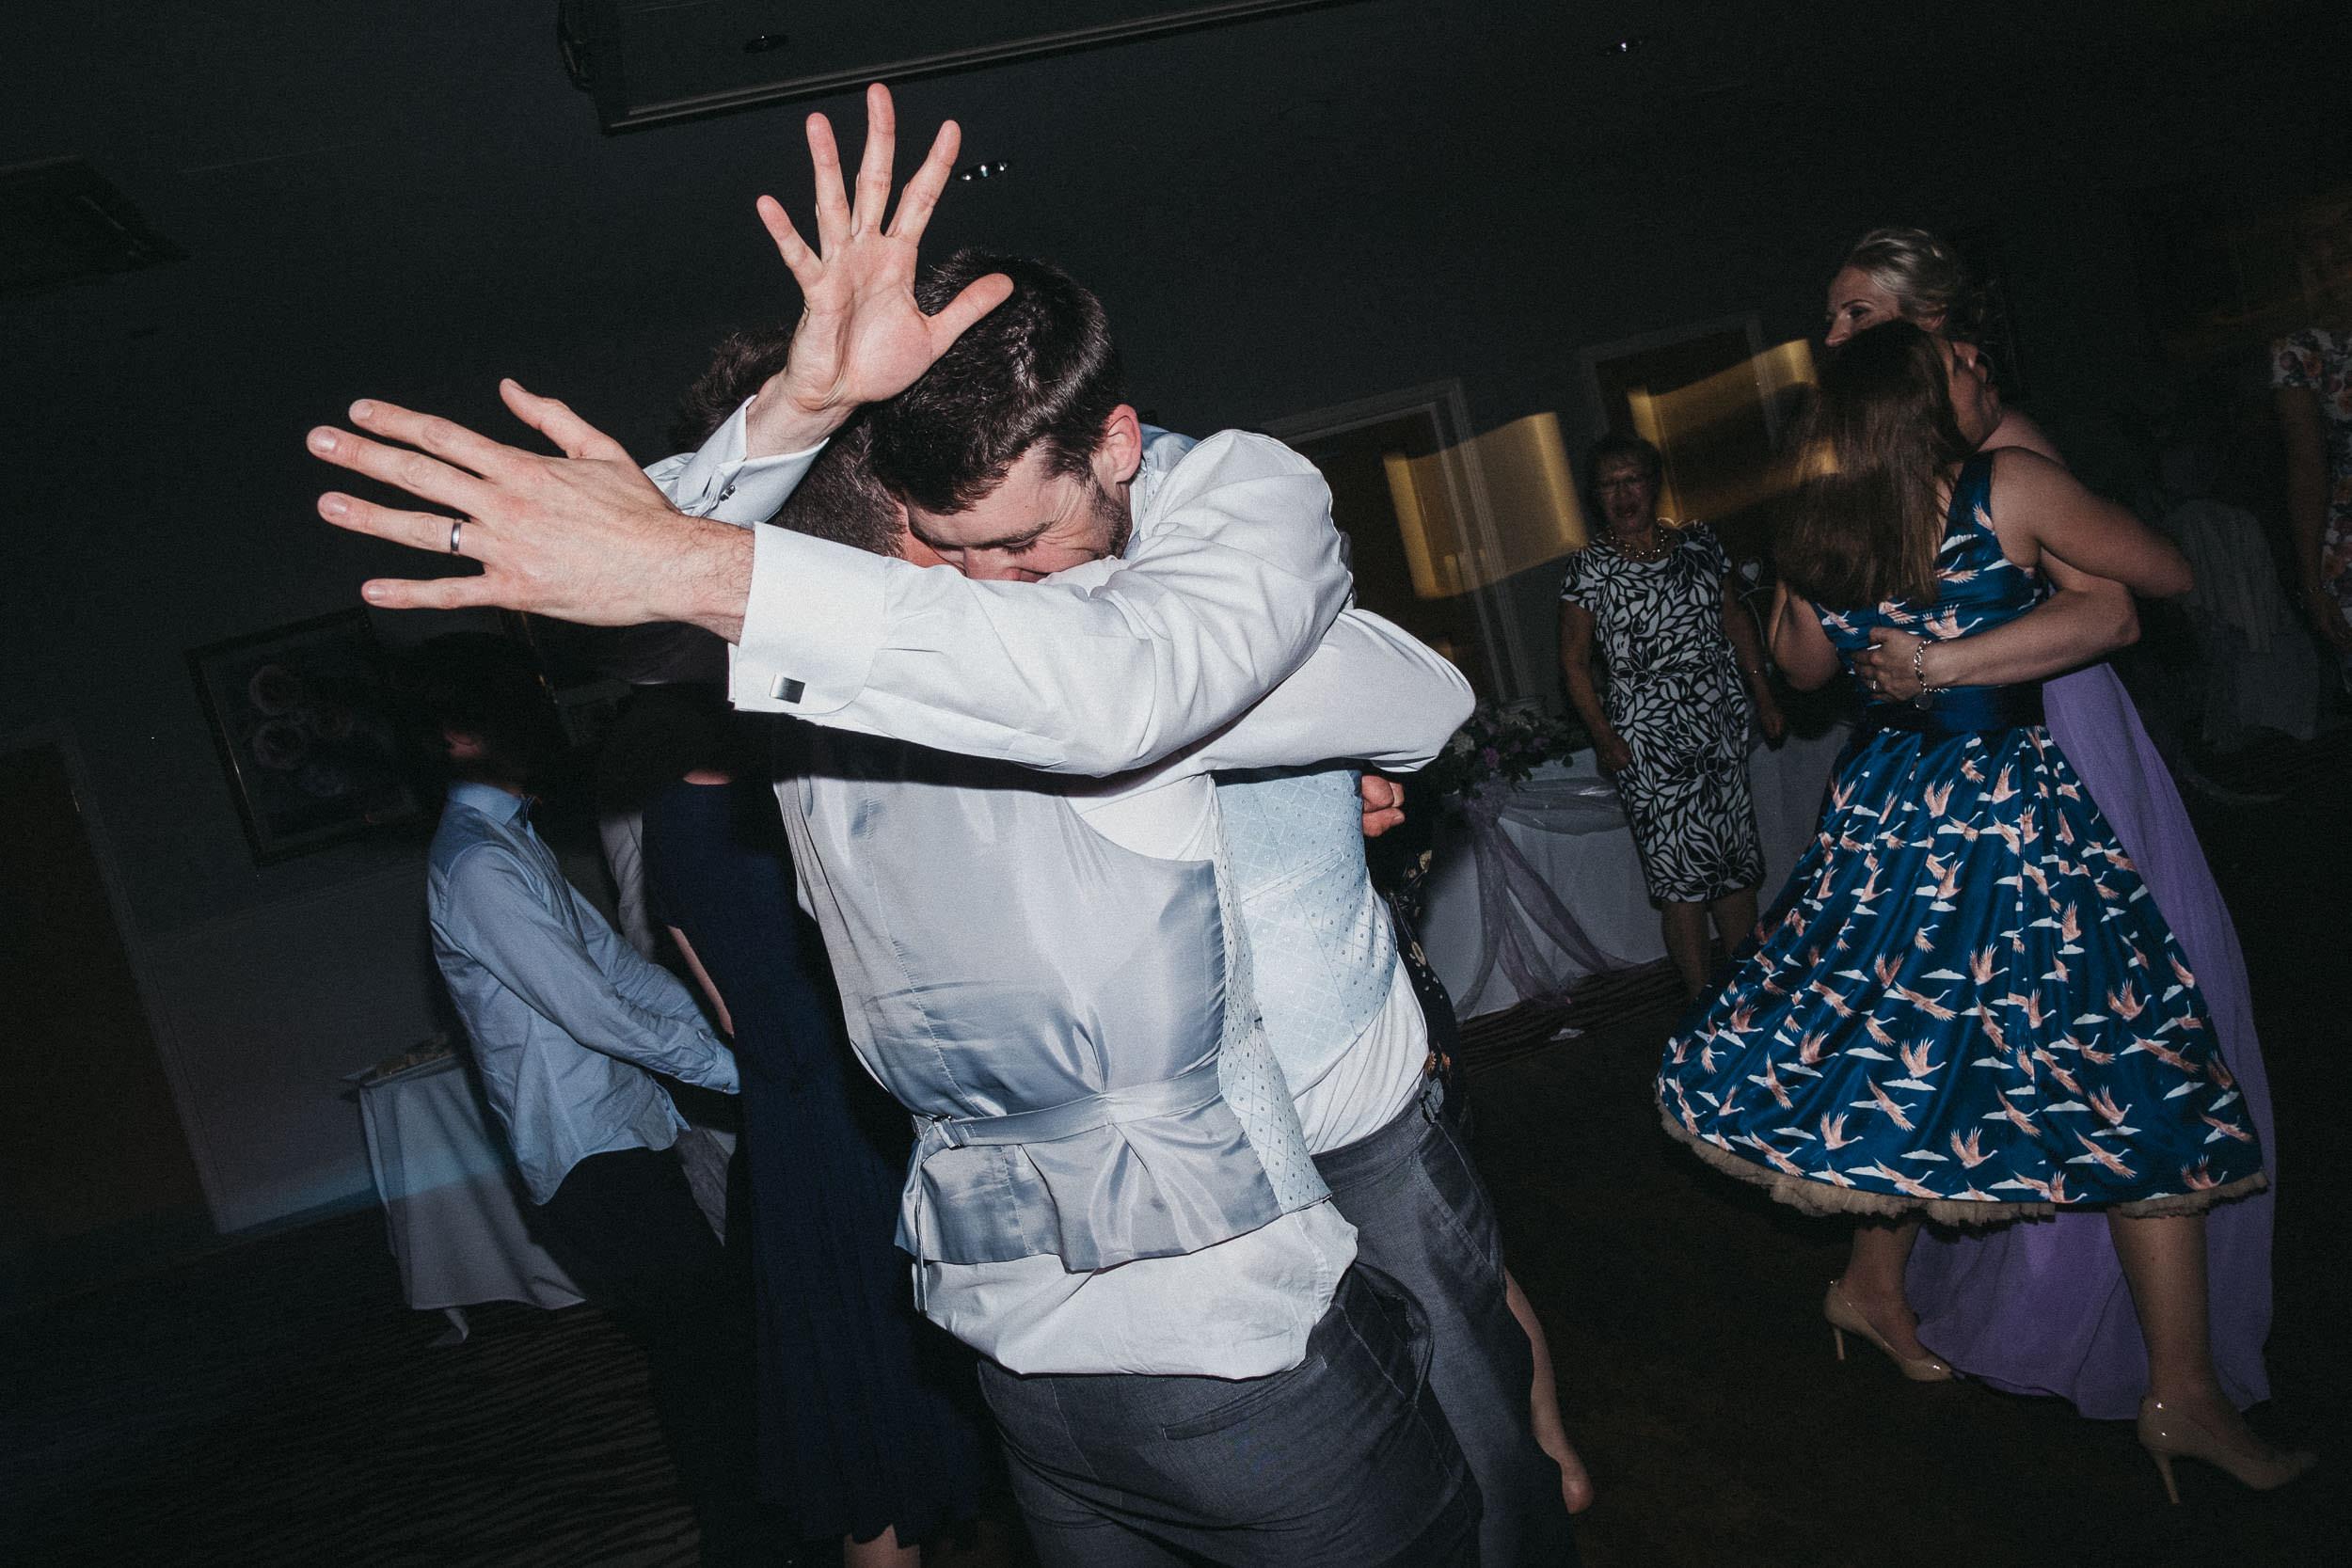 Groomsman throws his arms around another groomsman